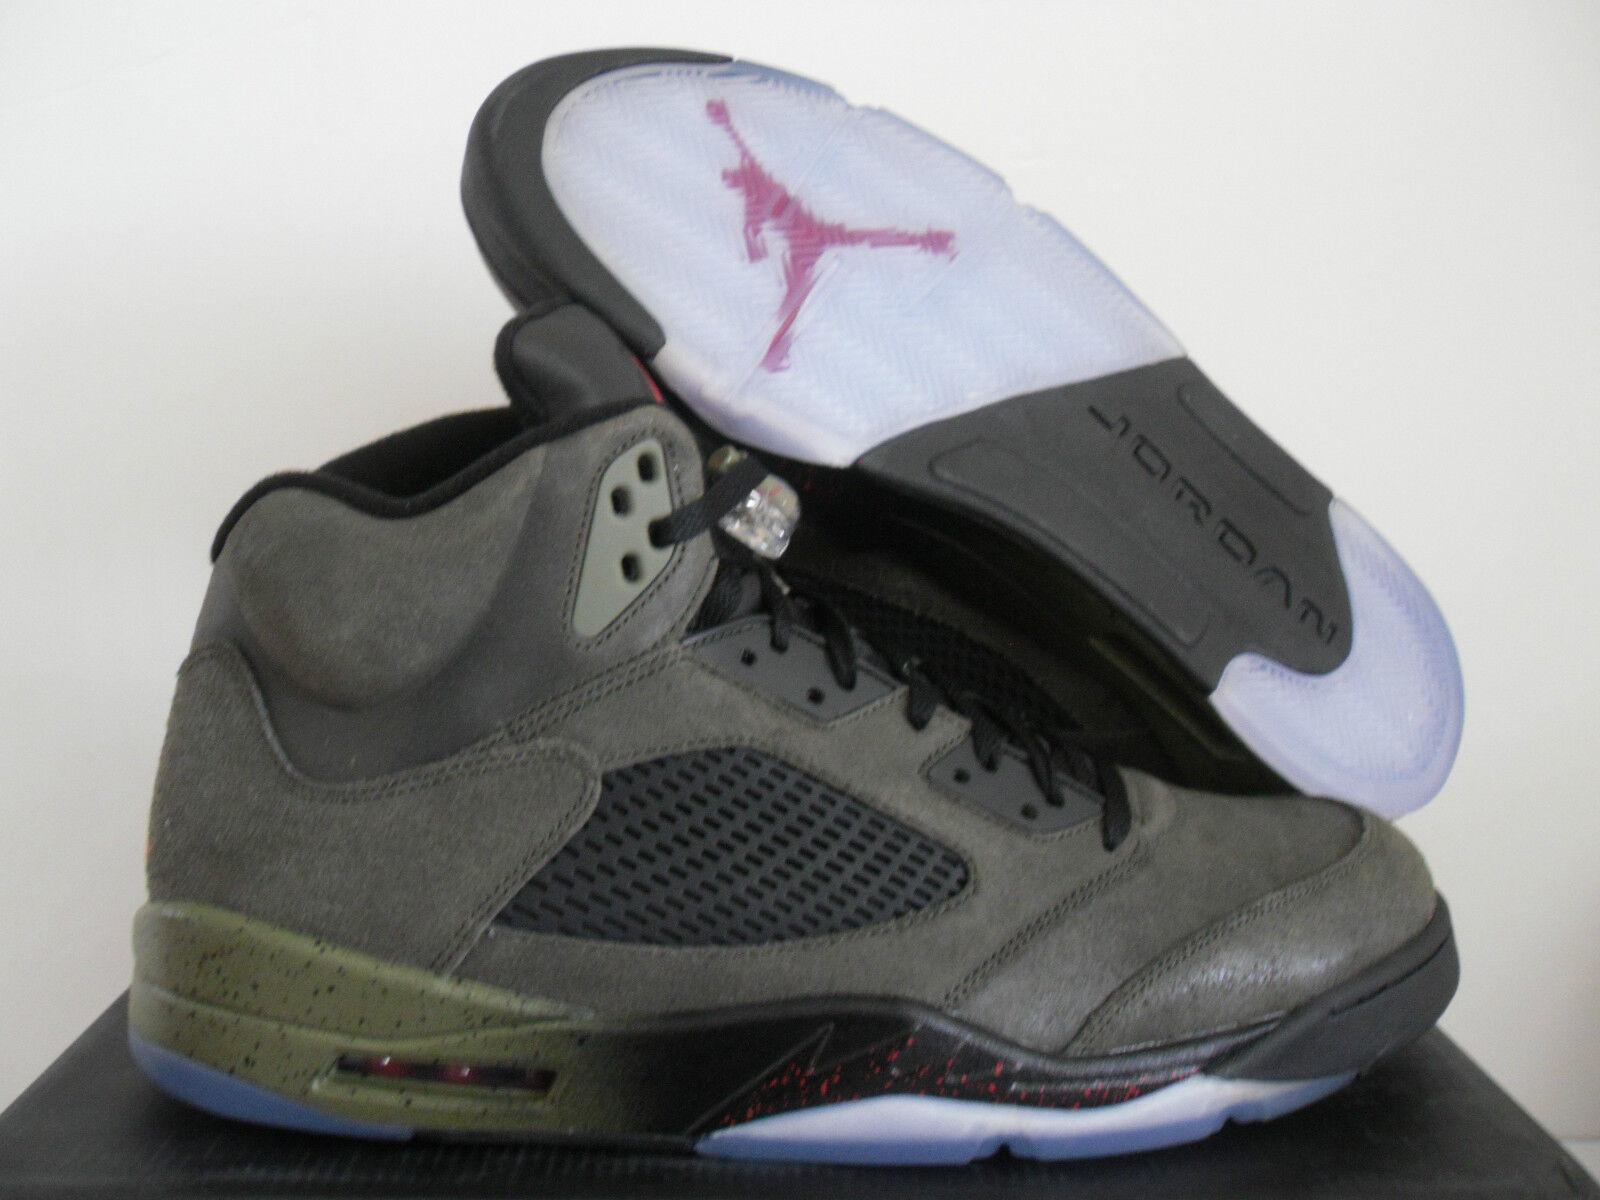 Nike Air Jordan 5 retro [626971-350] miedo 5 SZ 14 [626971-350] retro dac397